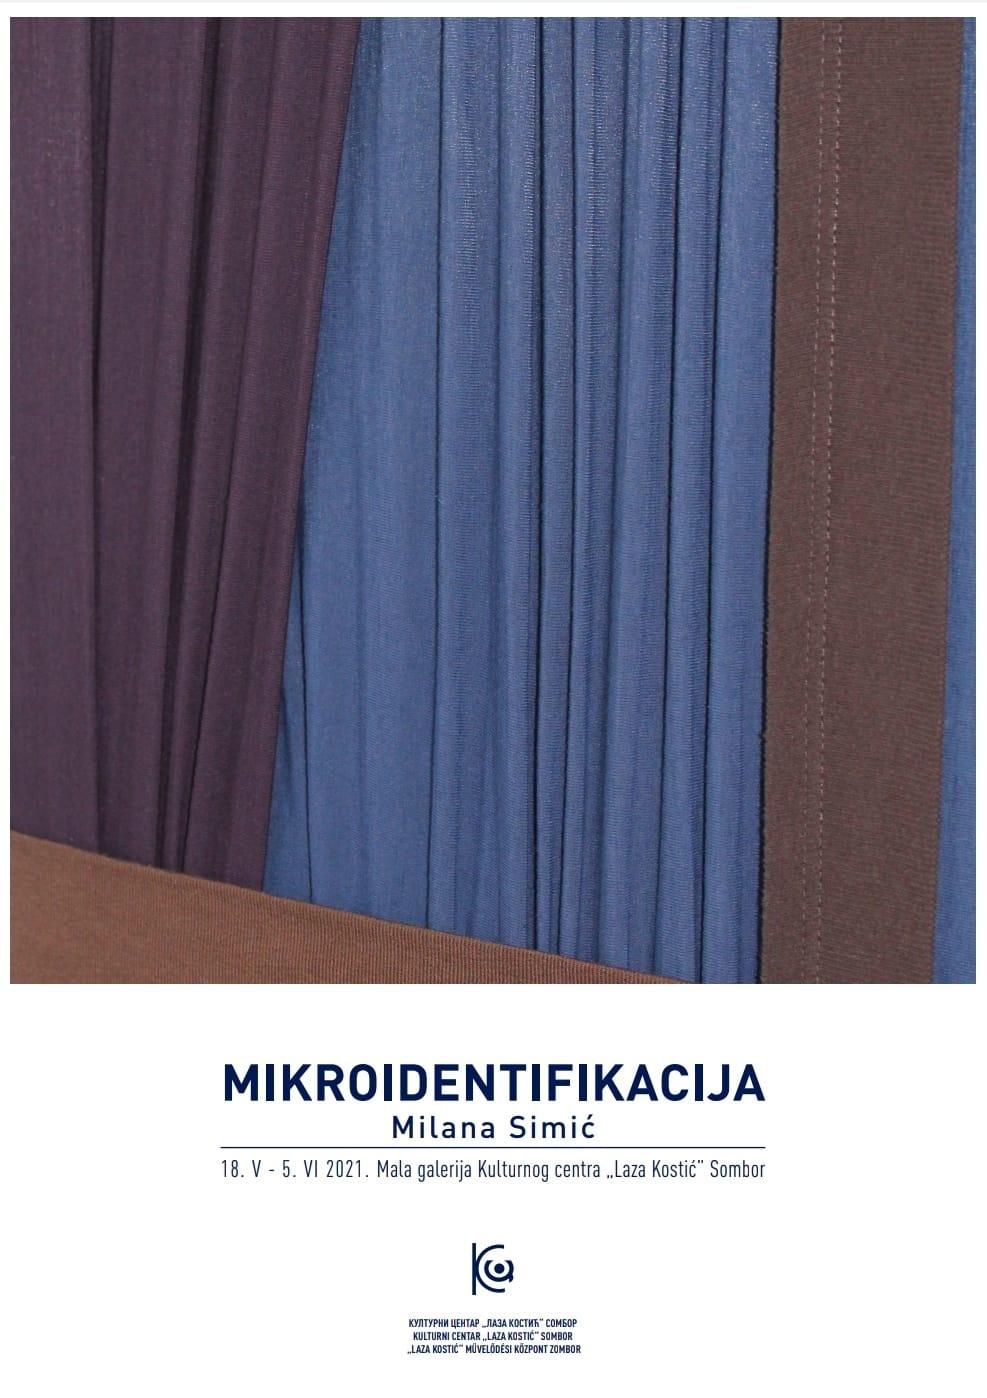 plakat-izlozba-mikroidentifikacija-milana-simic-2021-sombor